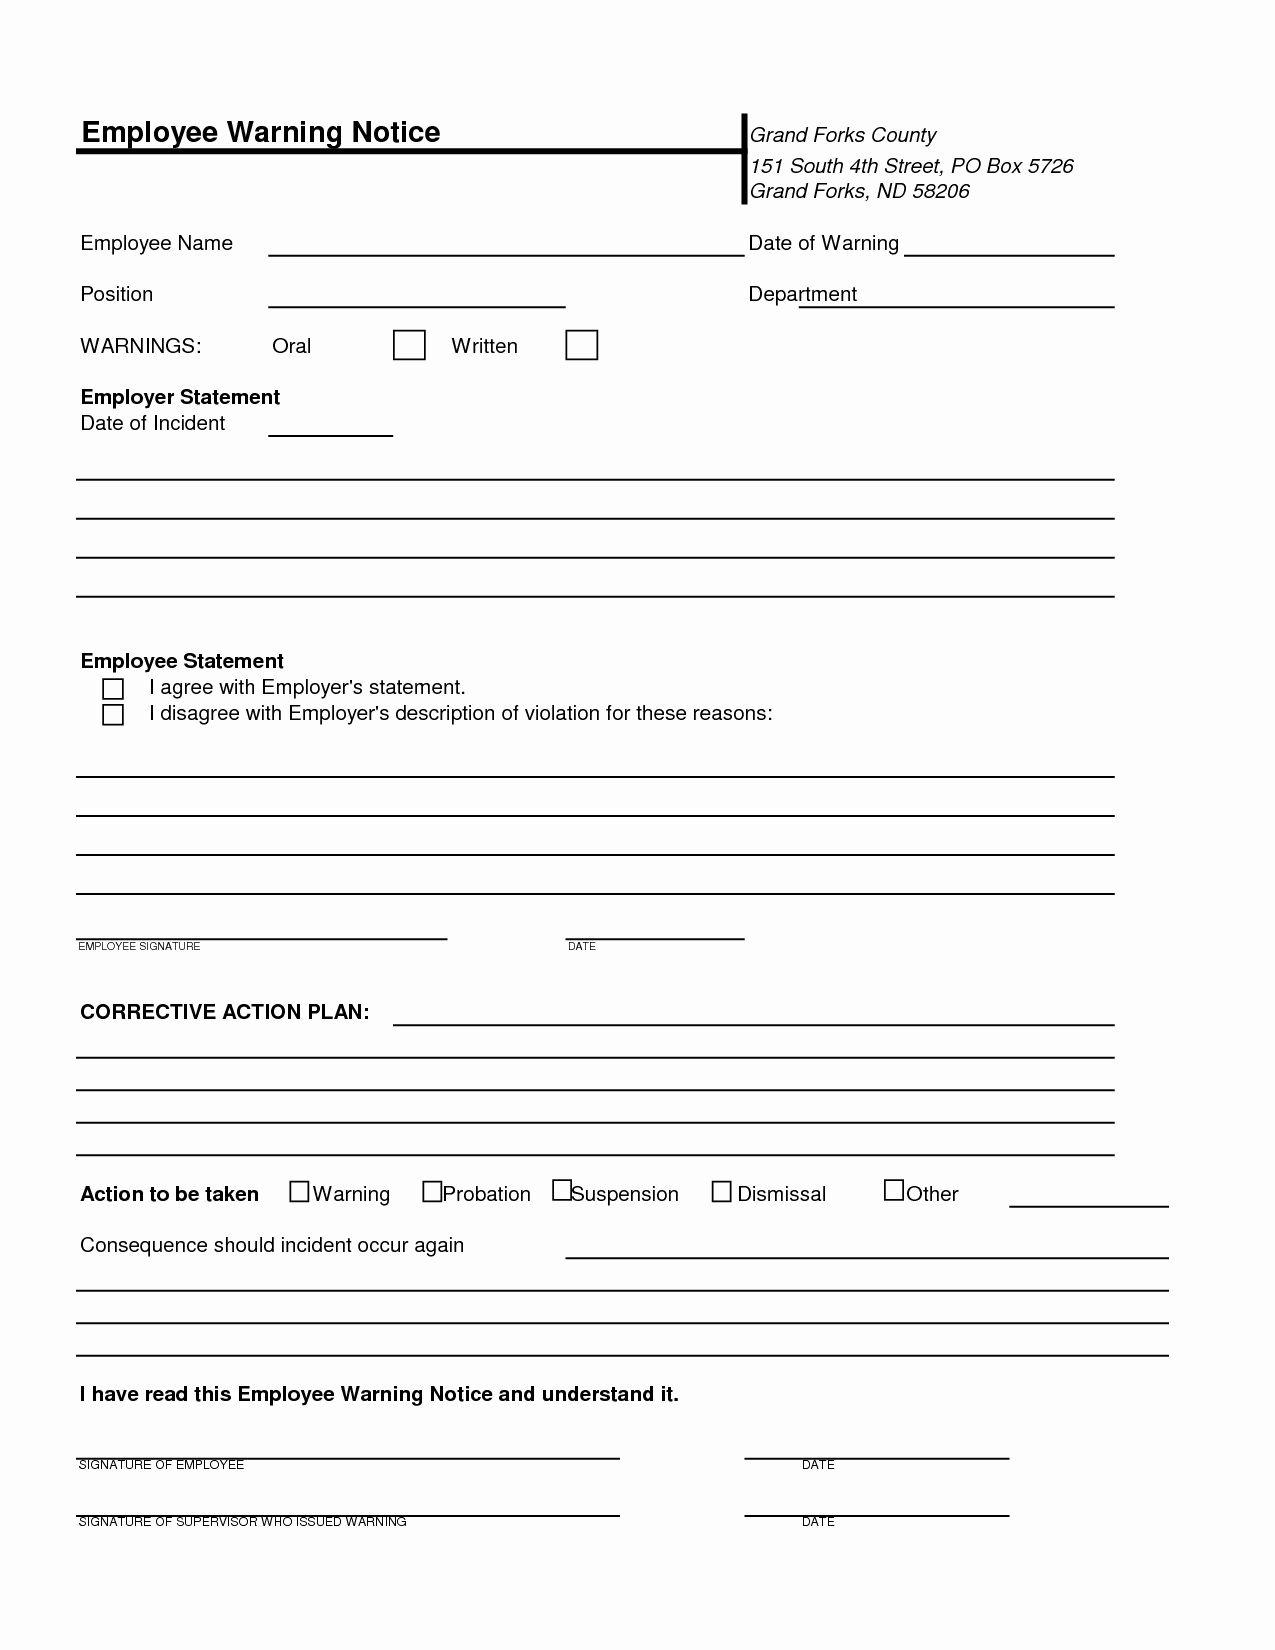 Free Printable Employee Write Up Form New Free Printable Employee Warning Notice Templates Business Template Template Free Write up at work template